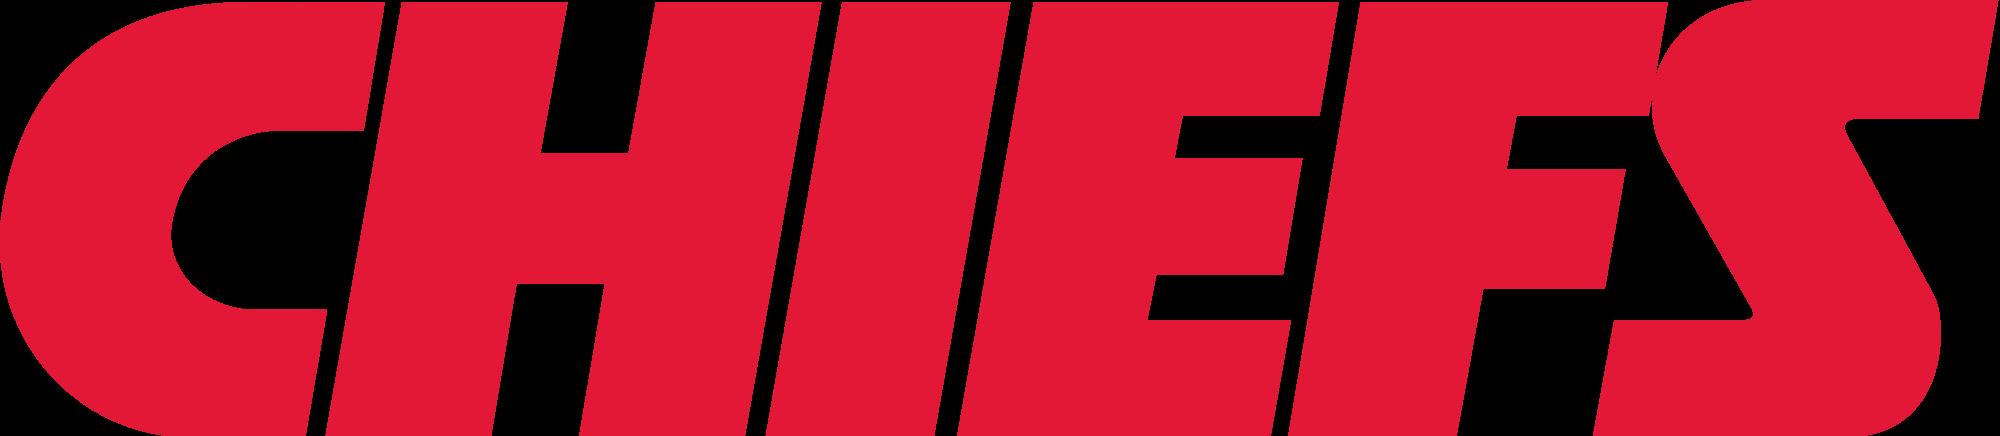 Open Hdpng.com  - Kansas City Chiefs, Transparent background PNG HD thumbnail